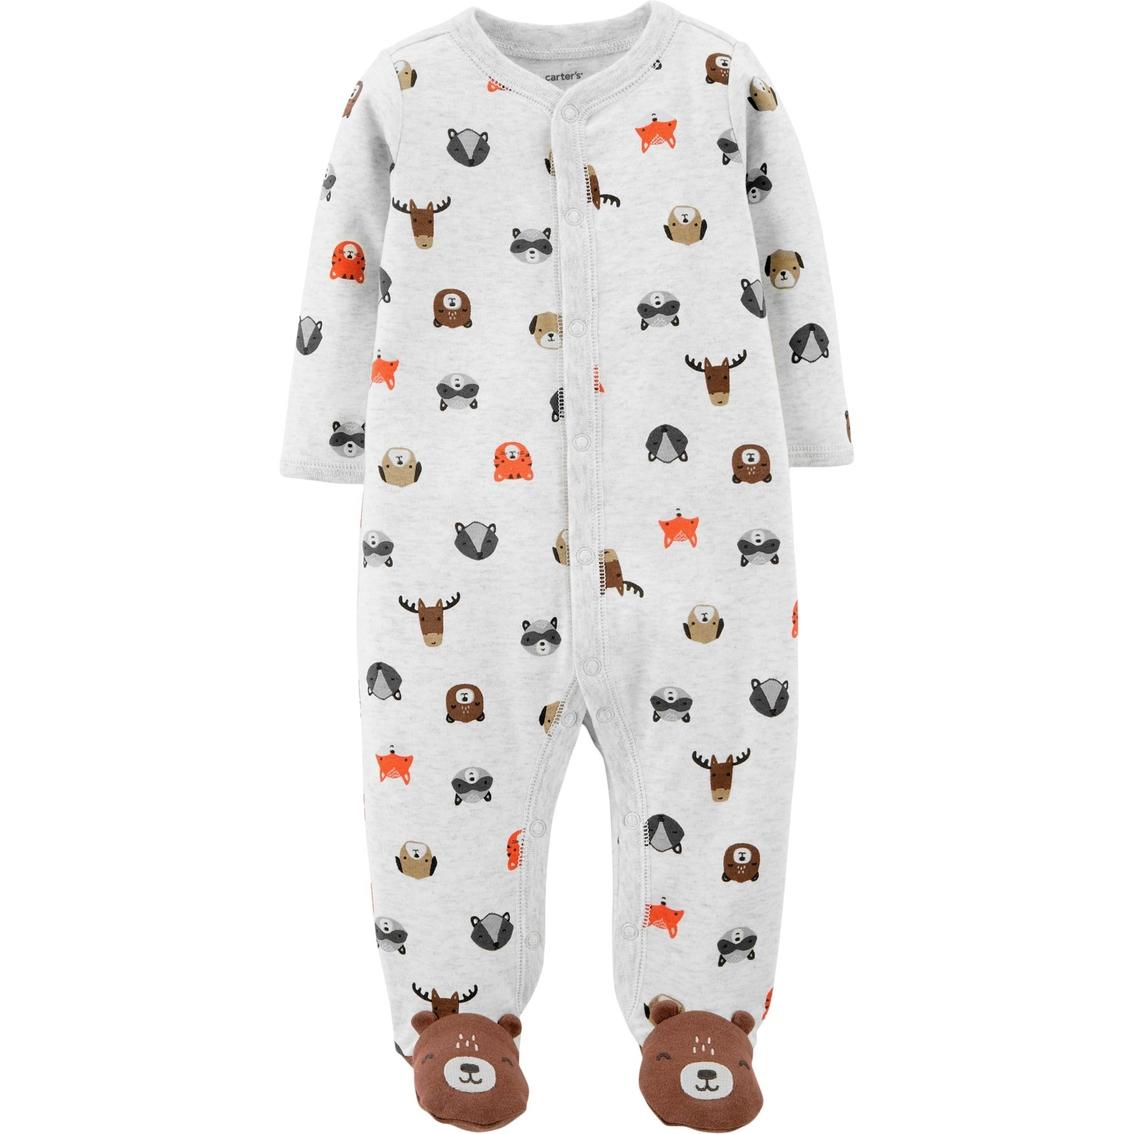 bc8efcaa1cd9 Carter s Infant Boys Animal Print Snap Up Sleep And Play